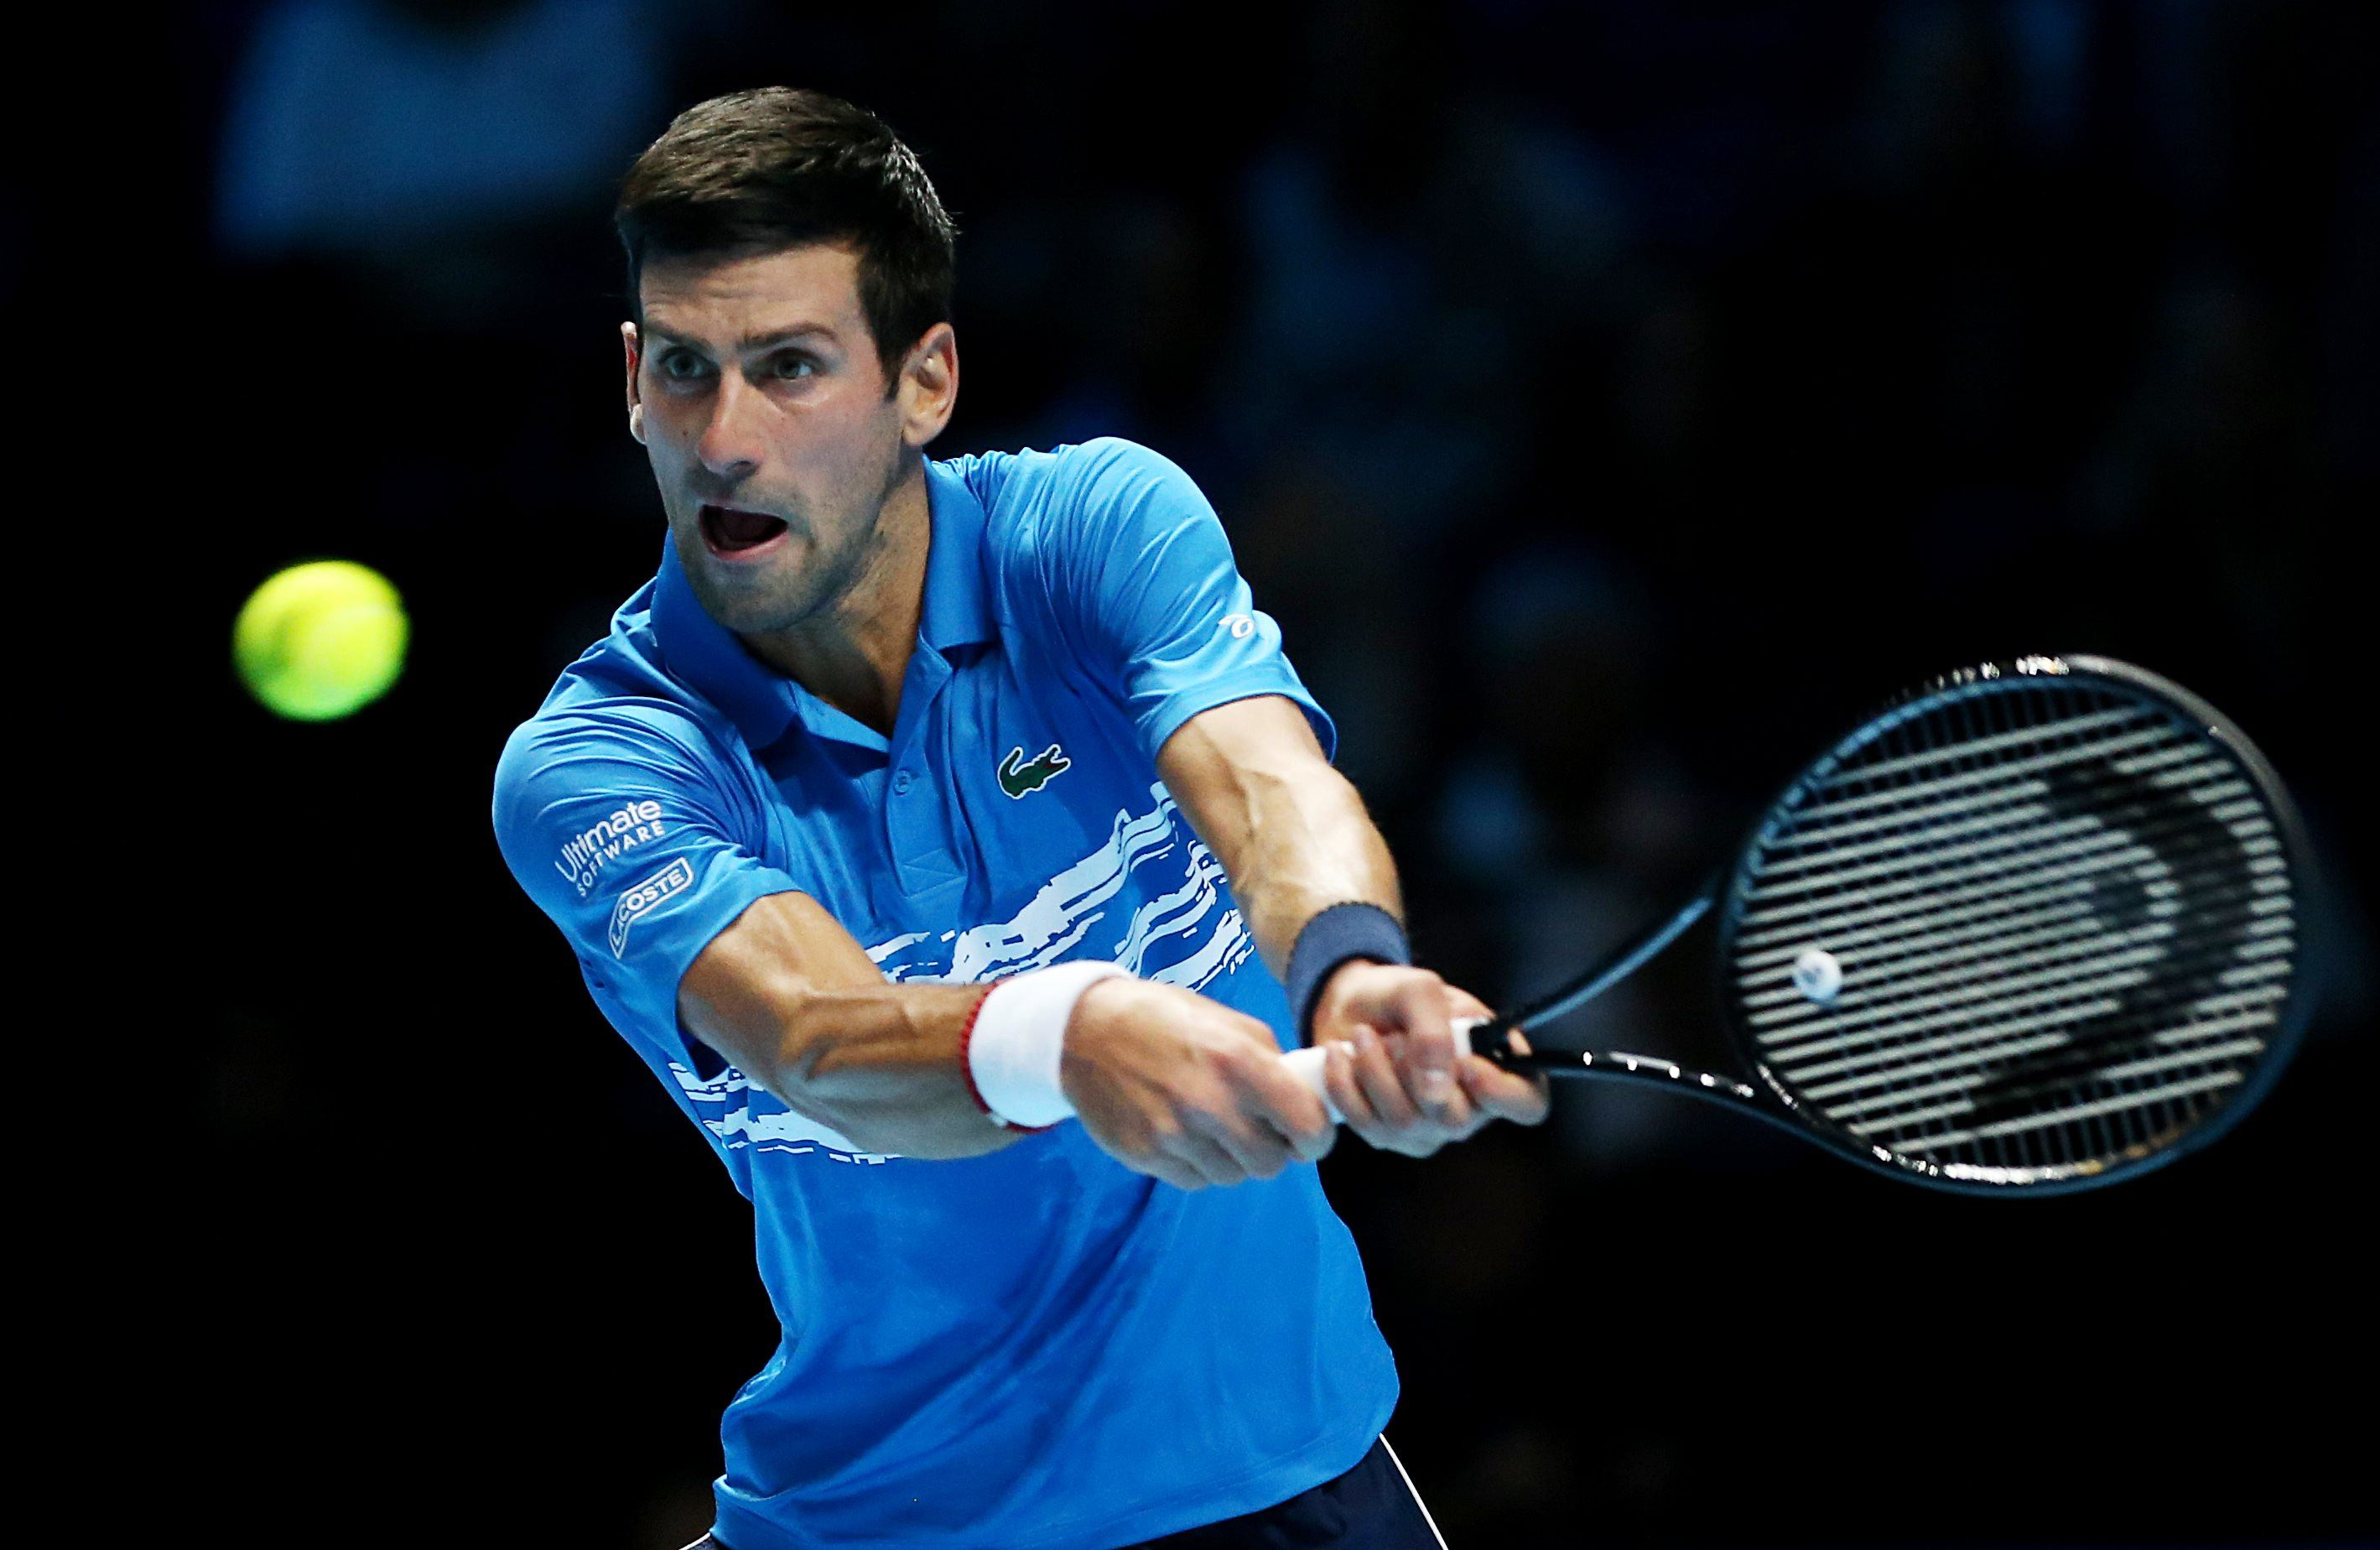 Tennis - Coupe Davis - Coupe Davis : Nadal, Djokovic, Murray... Les stars sont presque toutes là